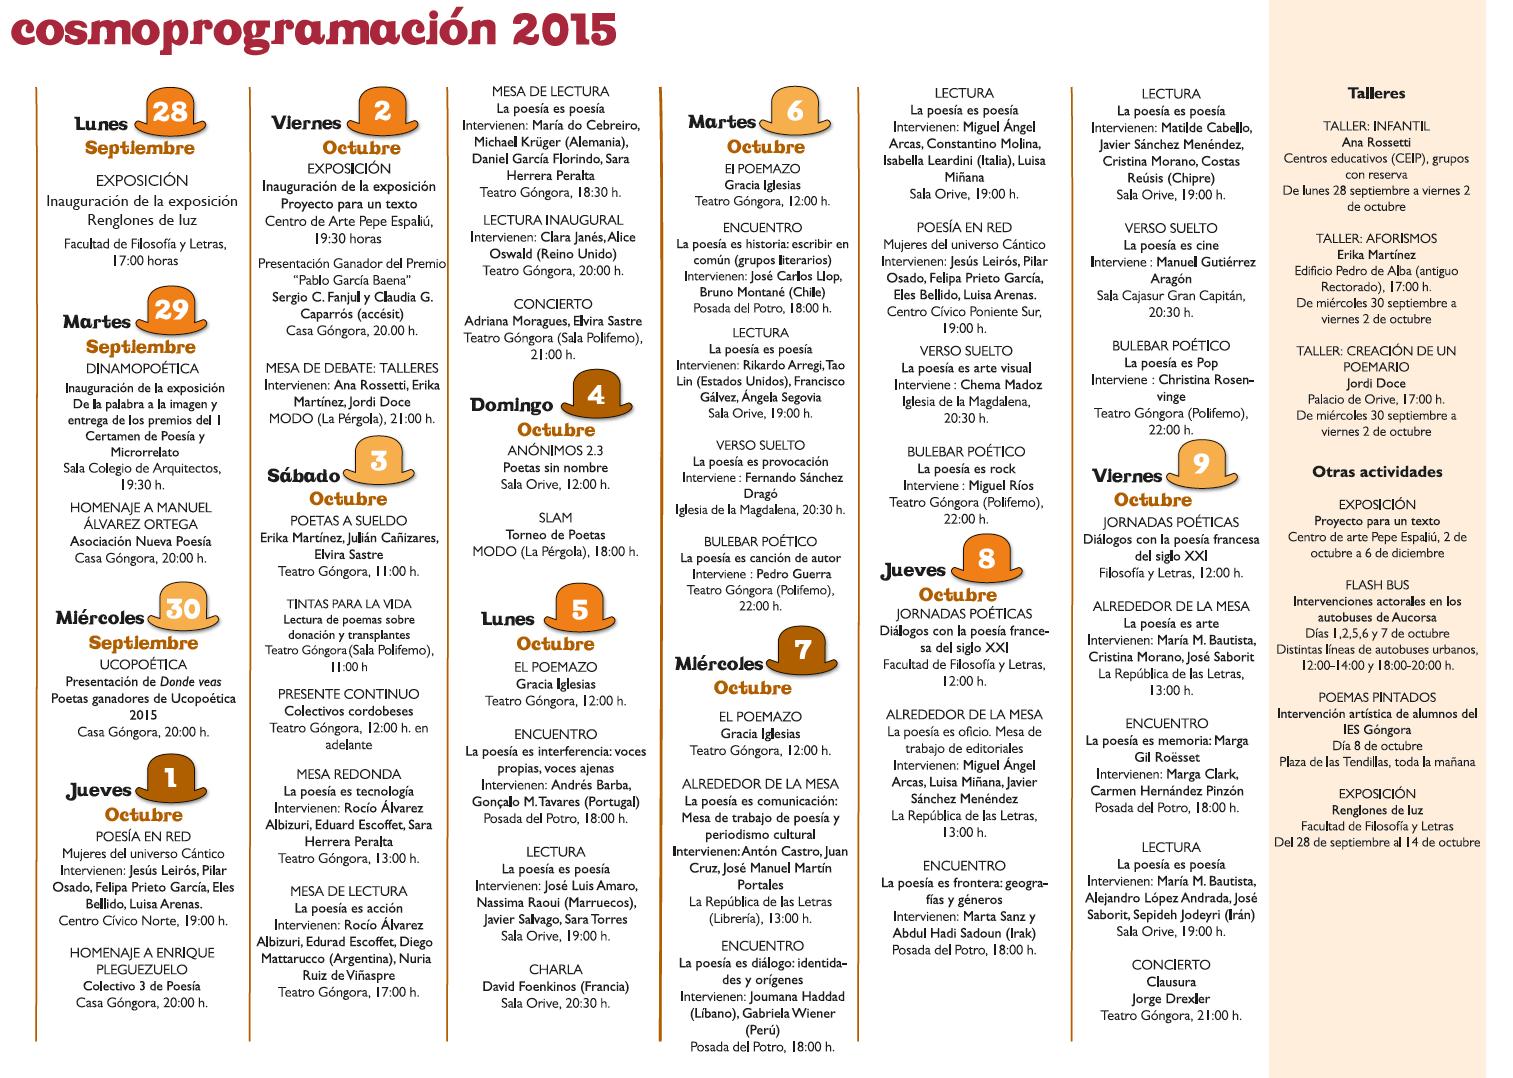 Cosmopoetica-programa-2015.png